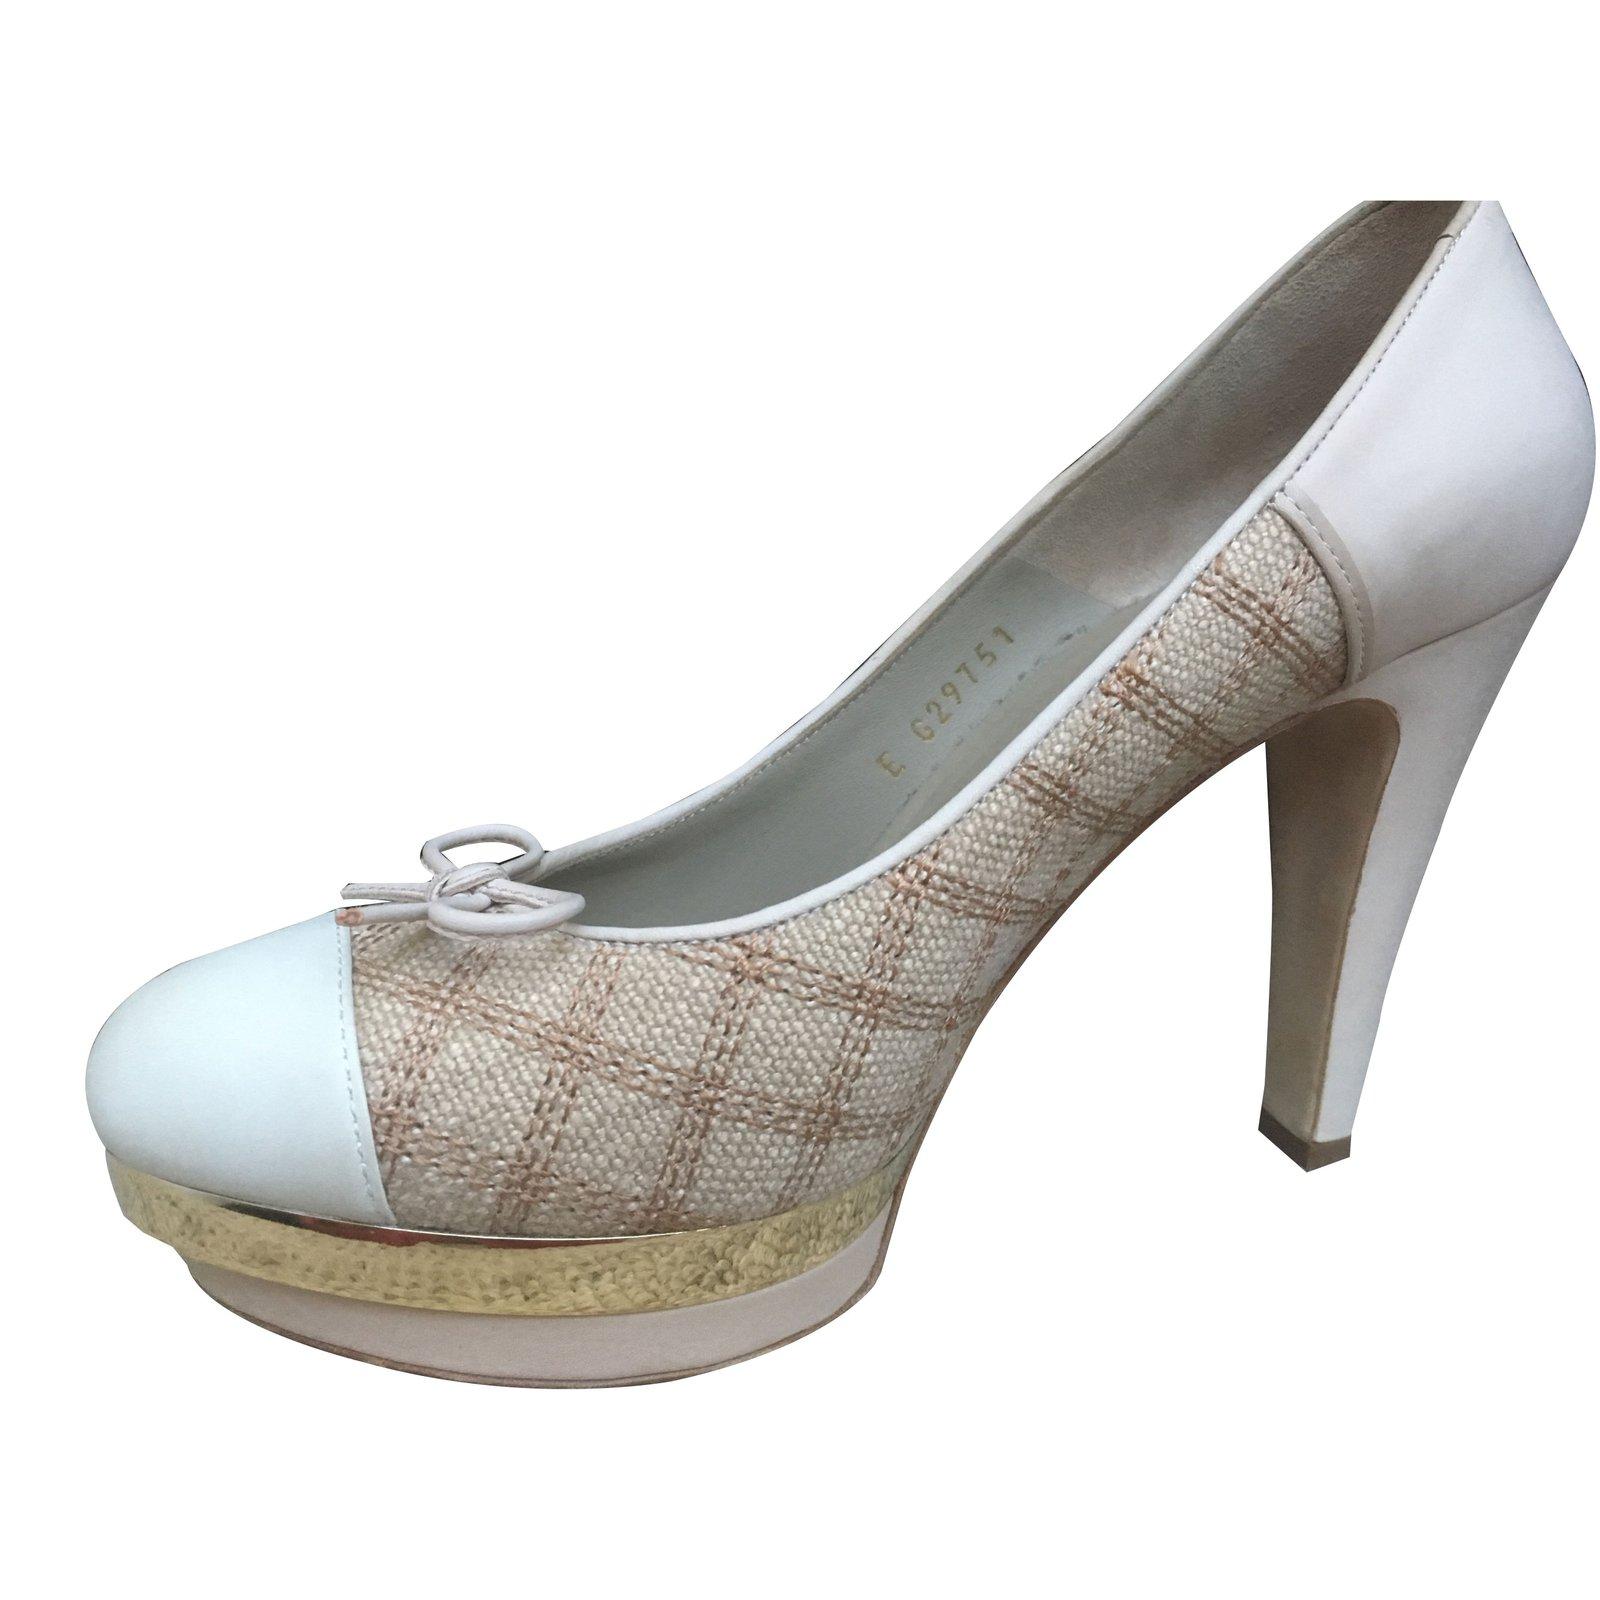 chanel platform heels